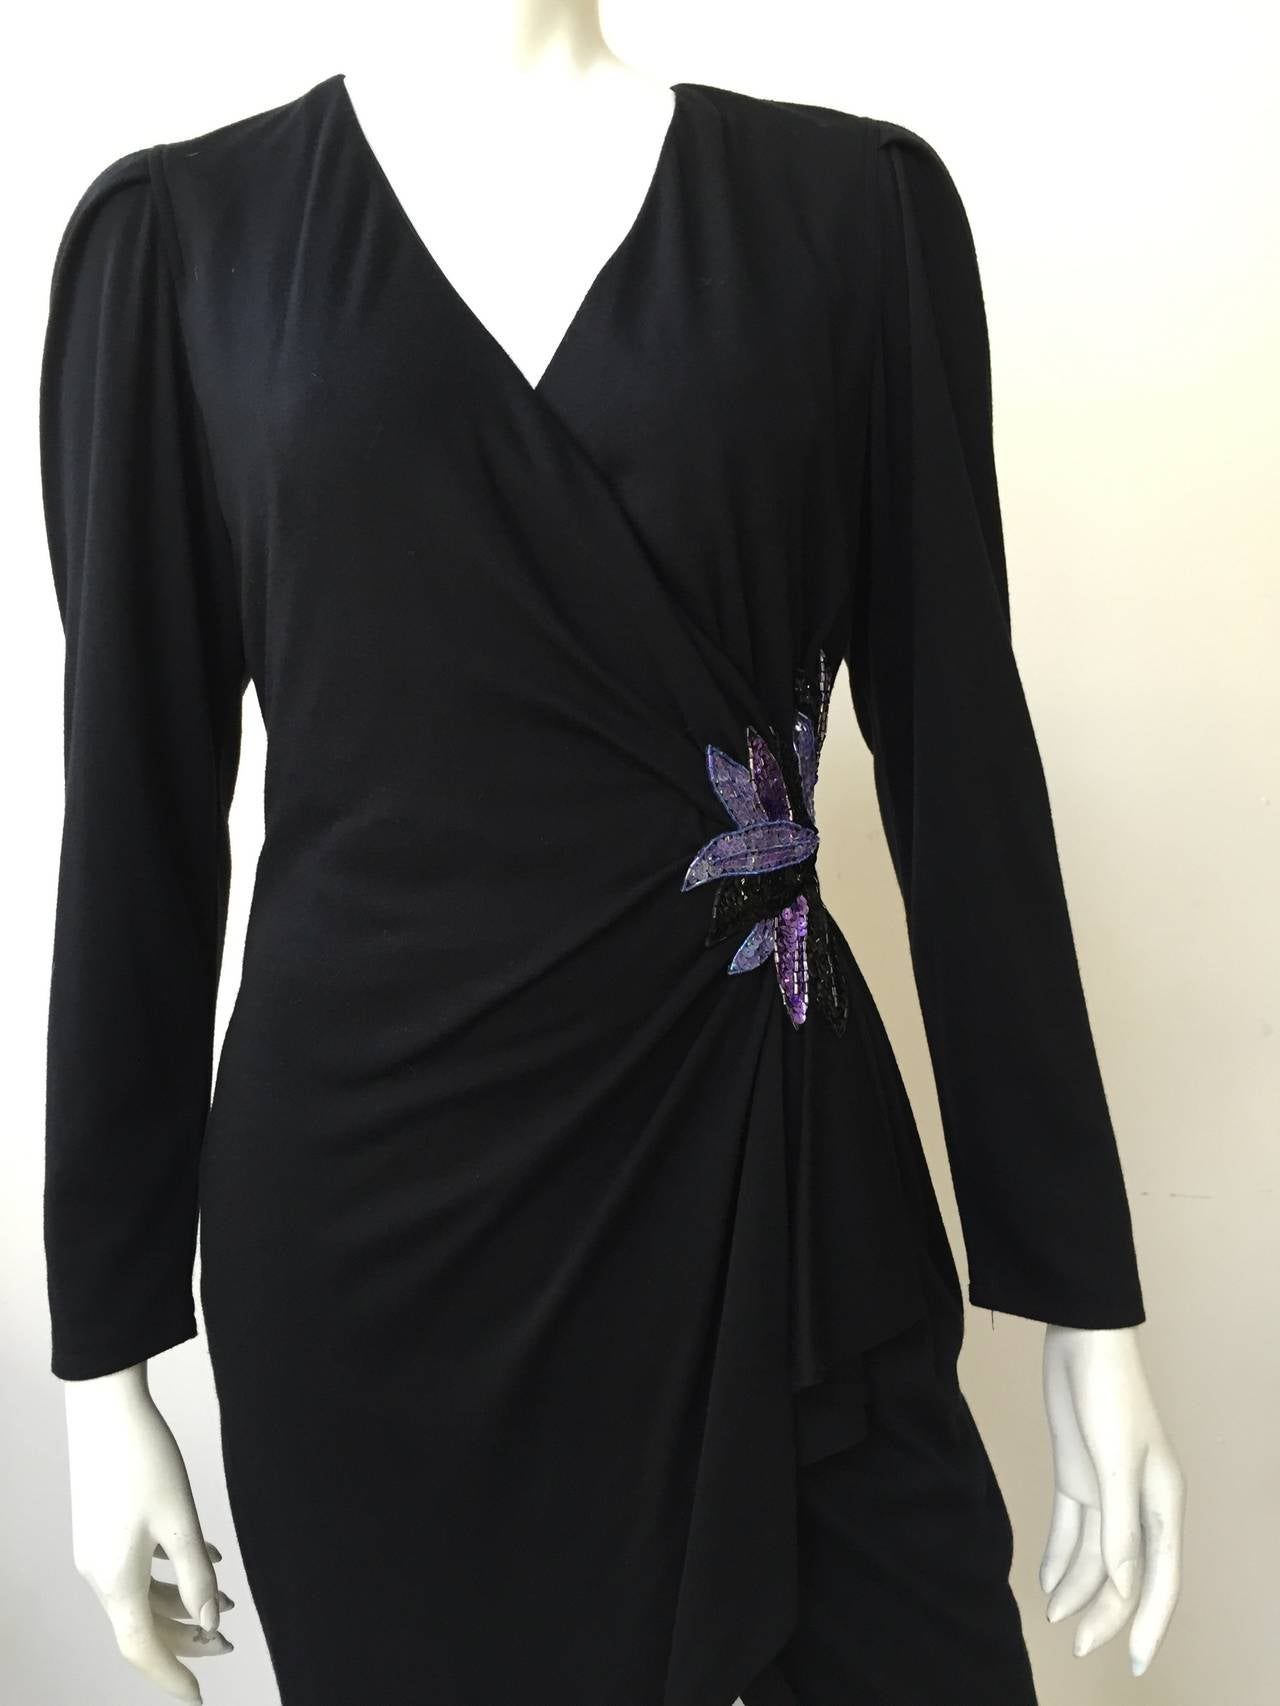 Zandra Rhodes 1980s Black with Sequin Dress Size 6. 3